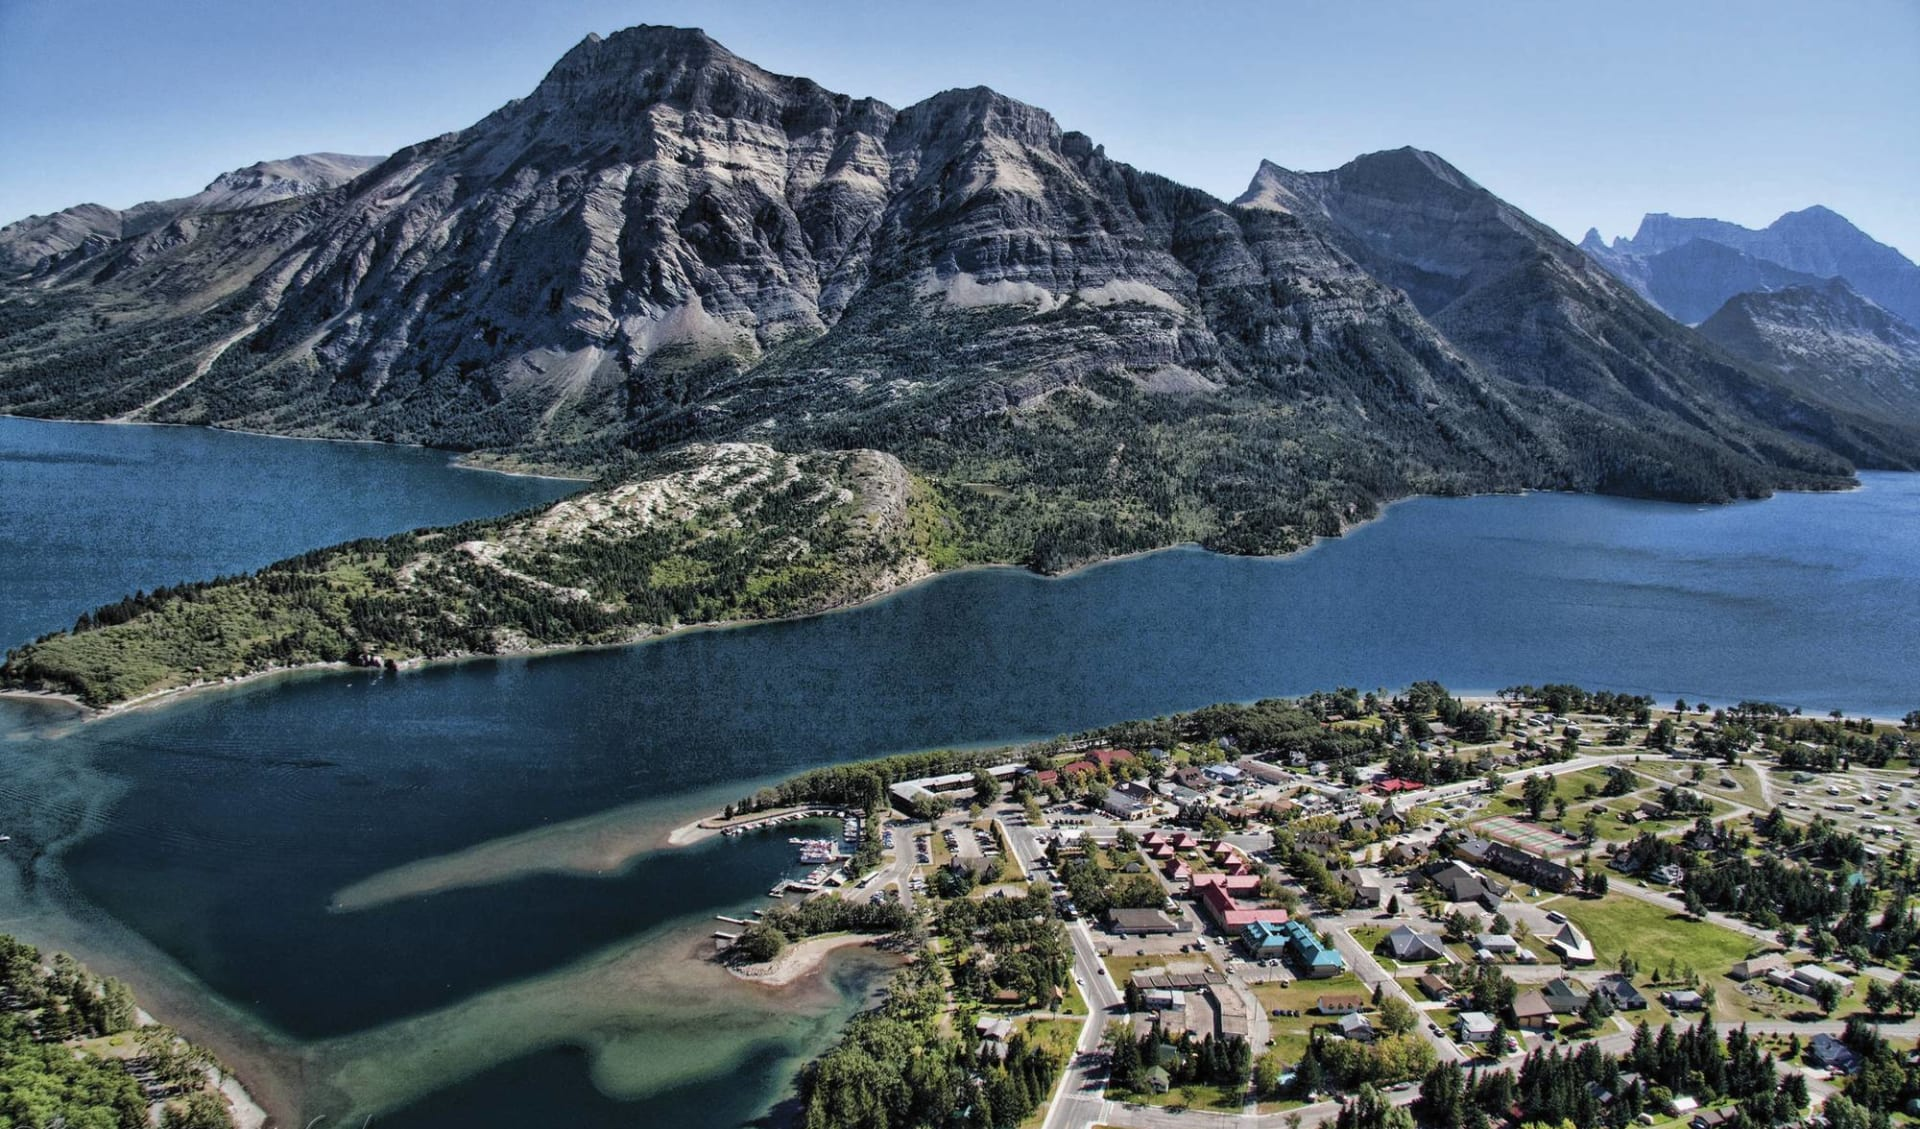 Wandern entlang der Geheimtipps Westkanadas ab Calgary: location: 2014_172_Waterton Lakes NP Townside